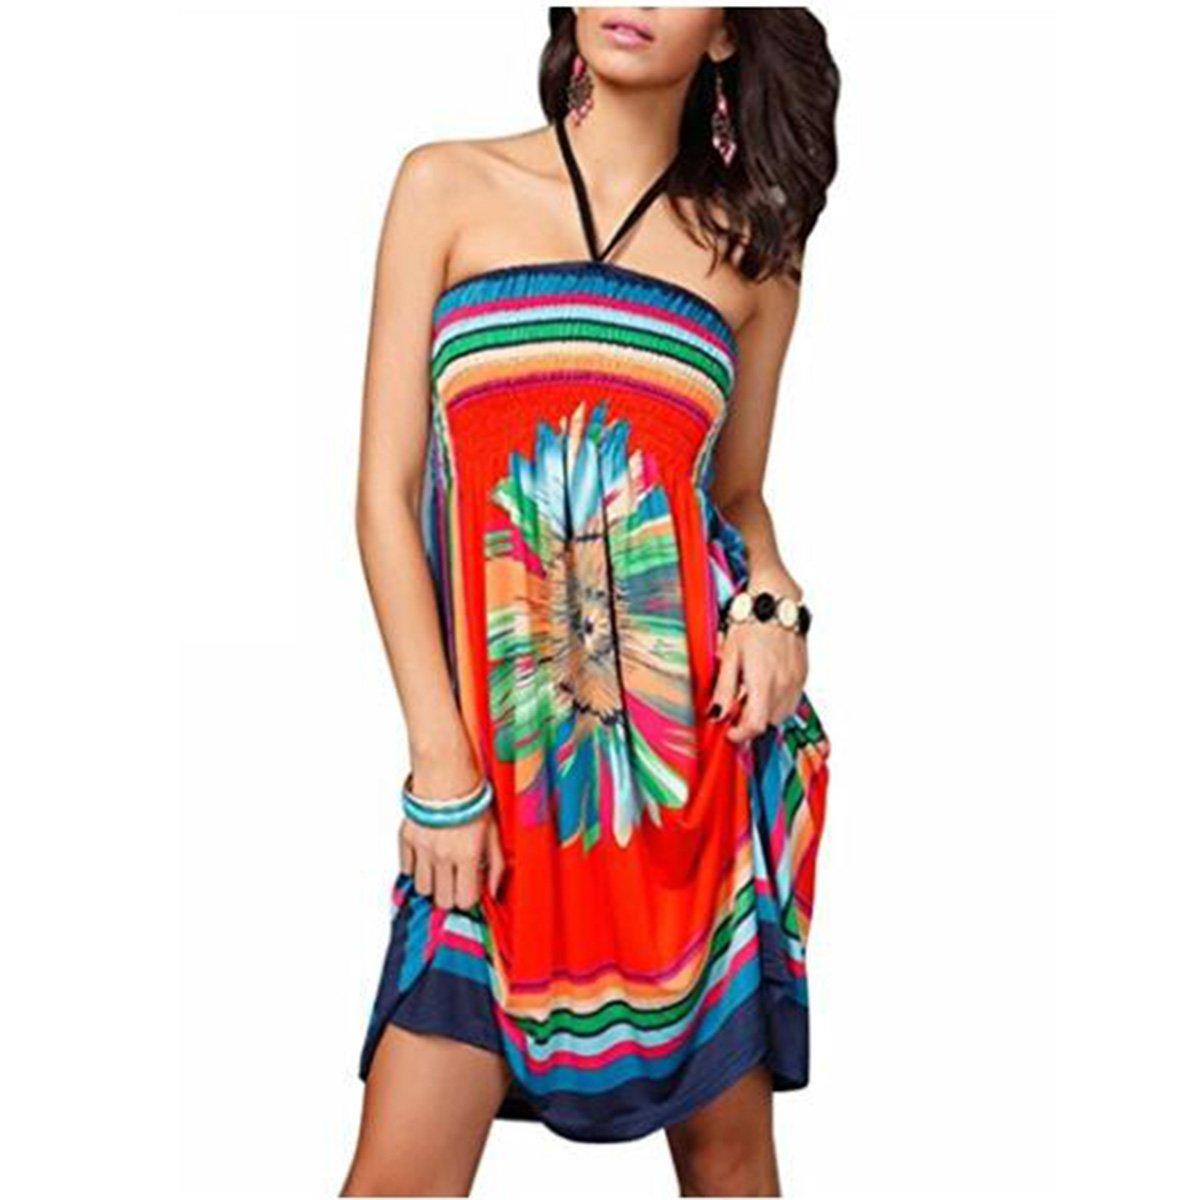 oboss Women Swimsuit Cover up Strapless Ethnic Boho Bandeau Beach Sun Dress Bathing Suit (Style 03-Orange)